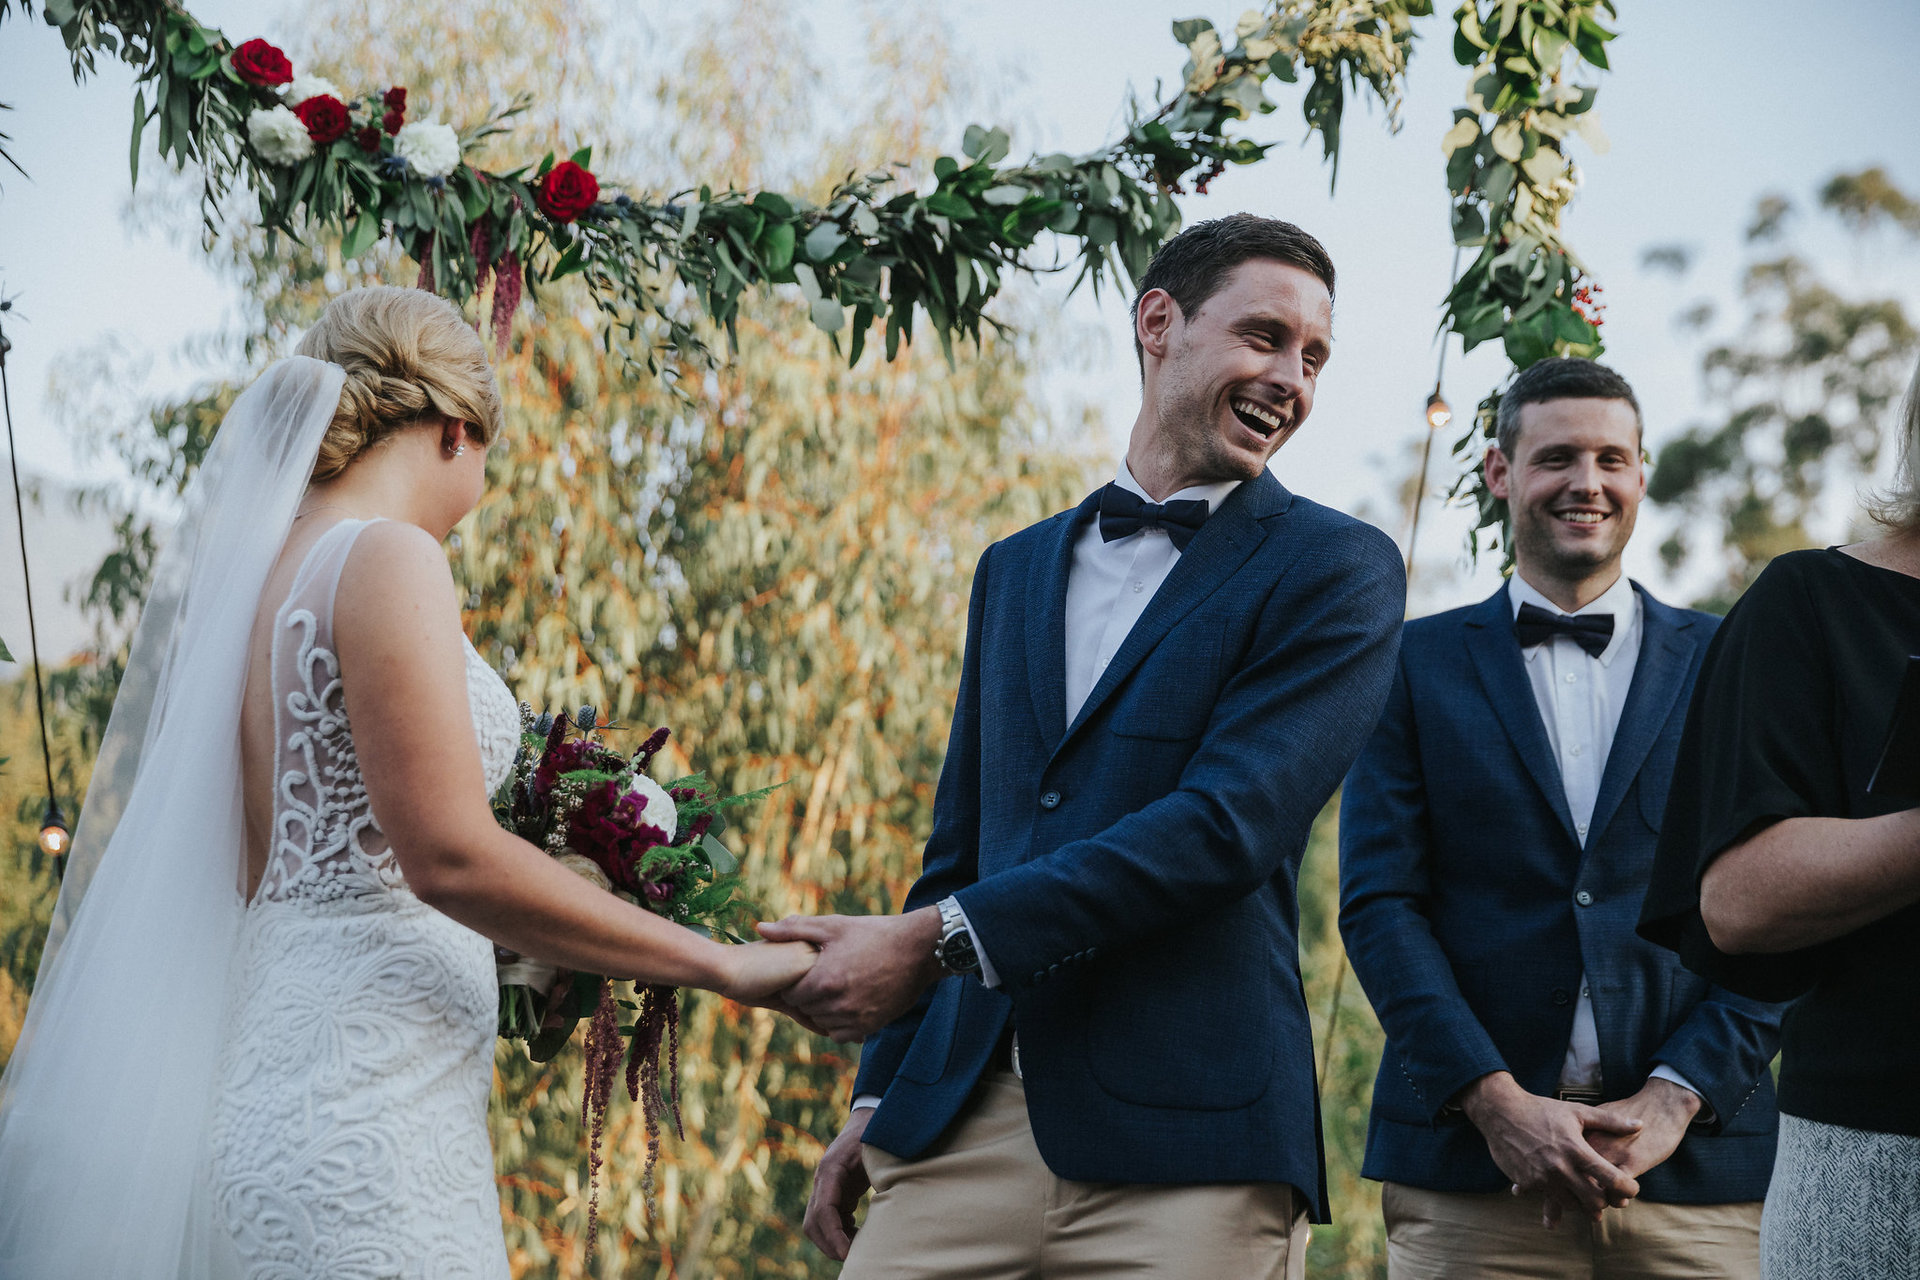 Yarra Valley Wedding Ceremony at Projekt 3488